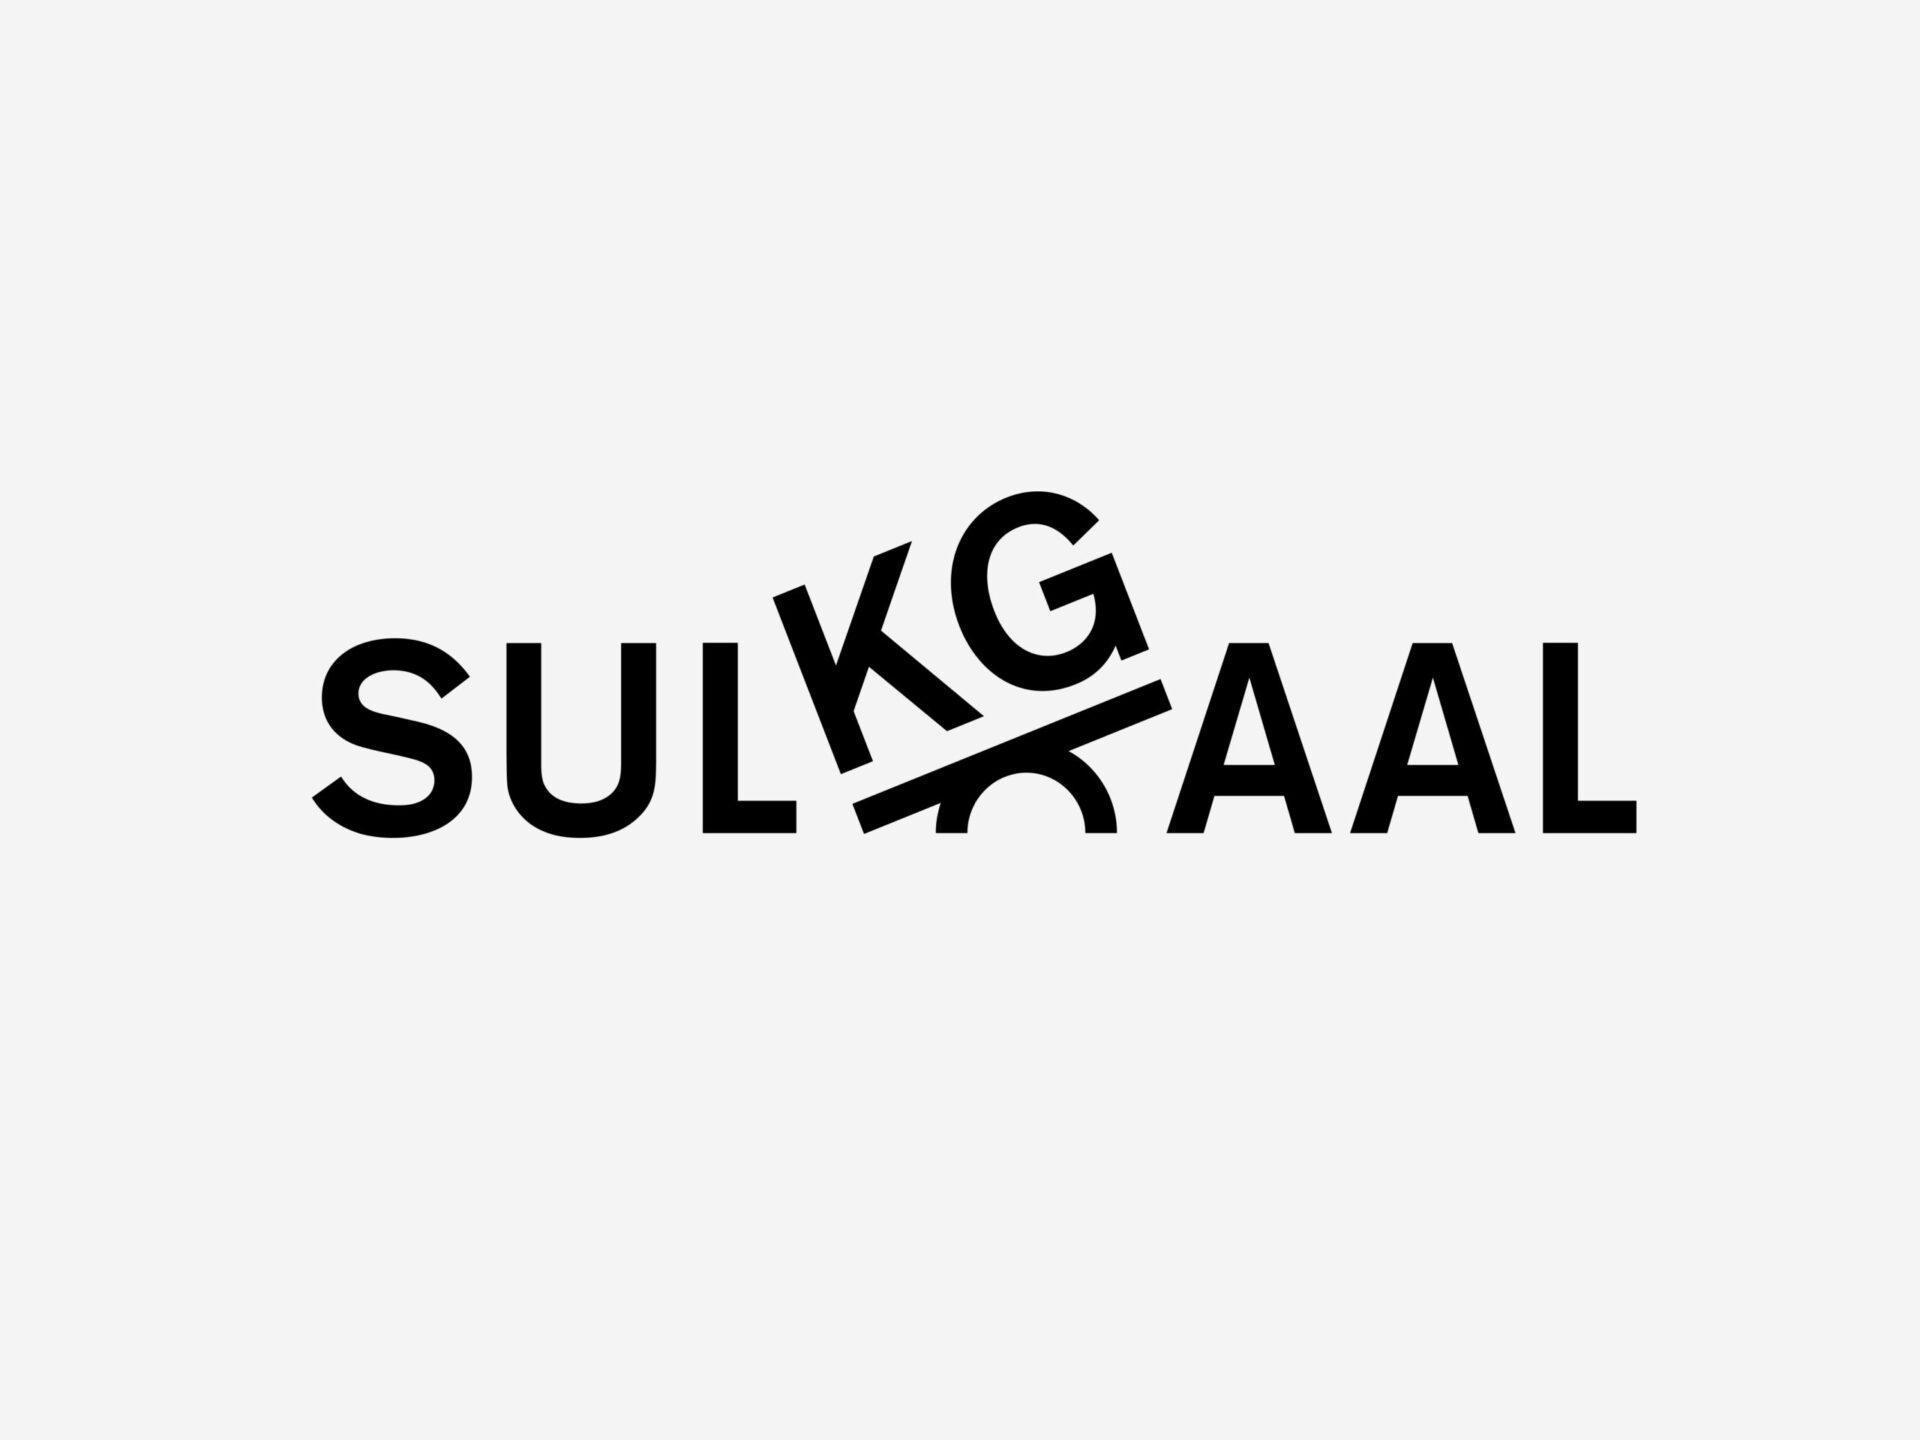 1_Sulgkaal_logo